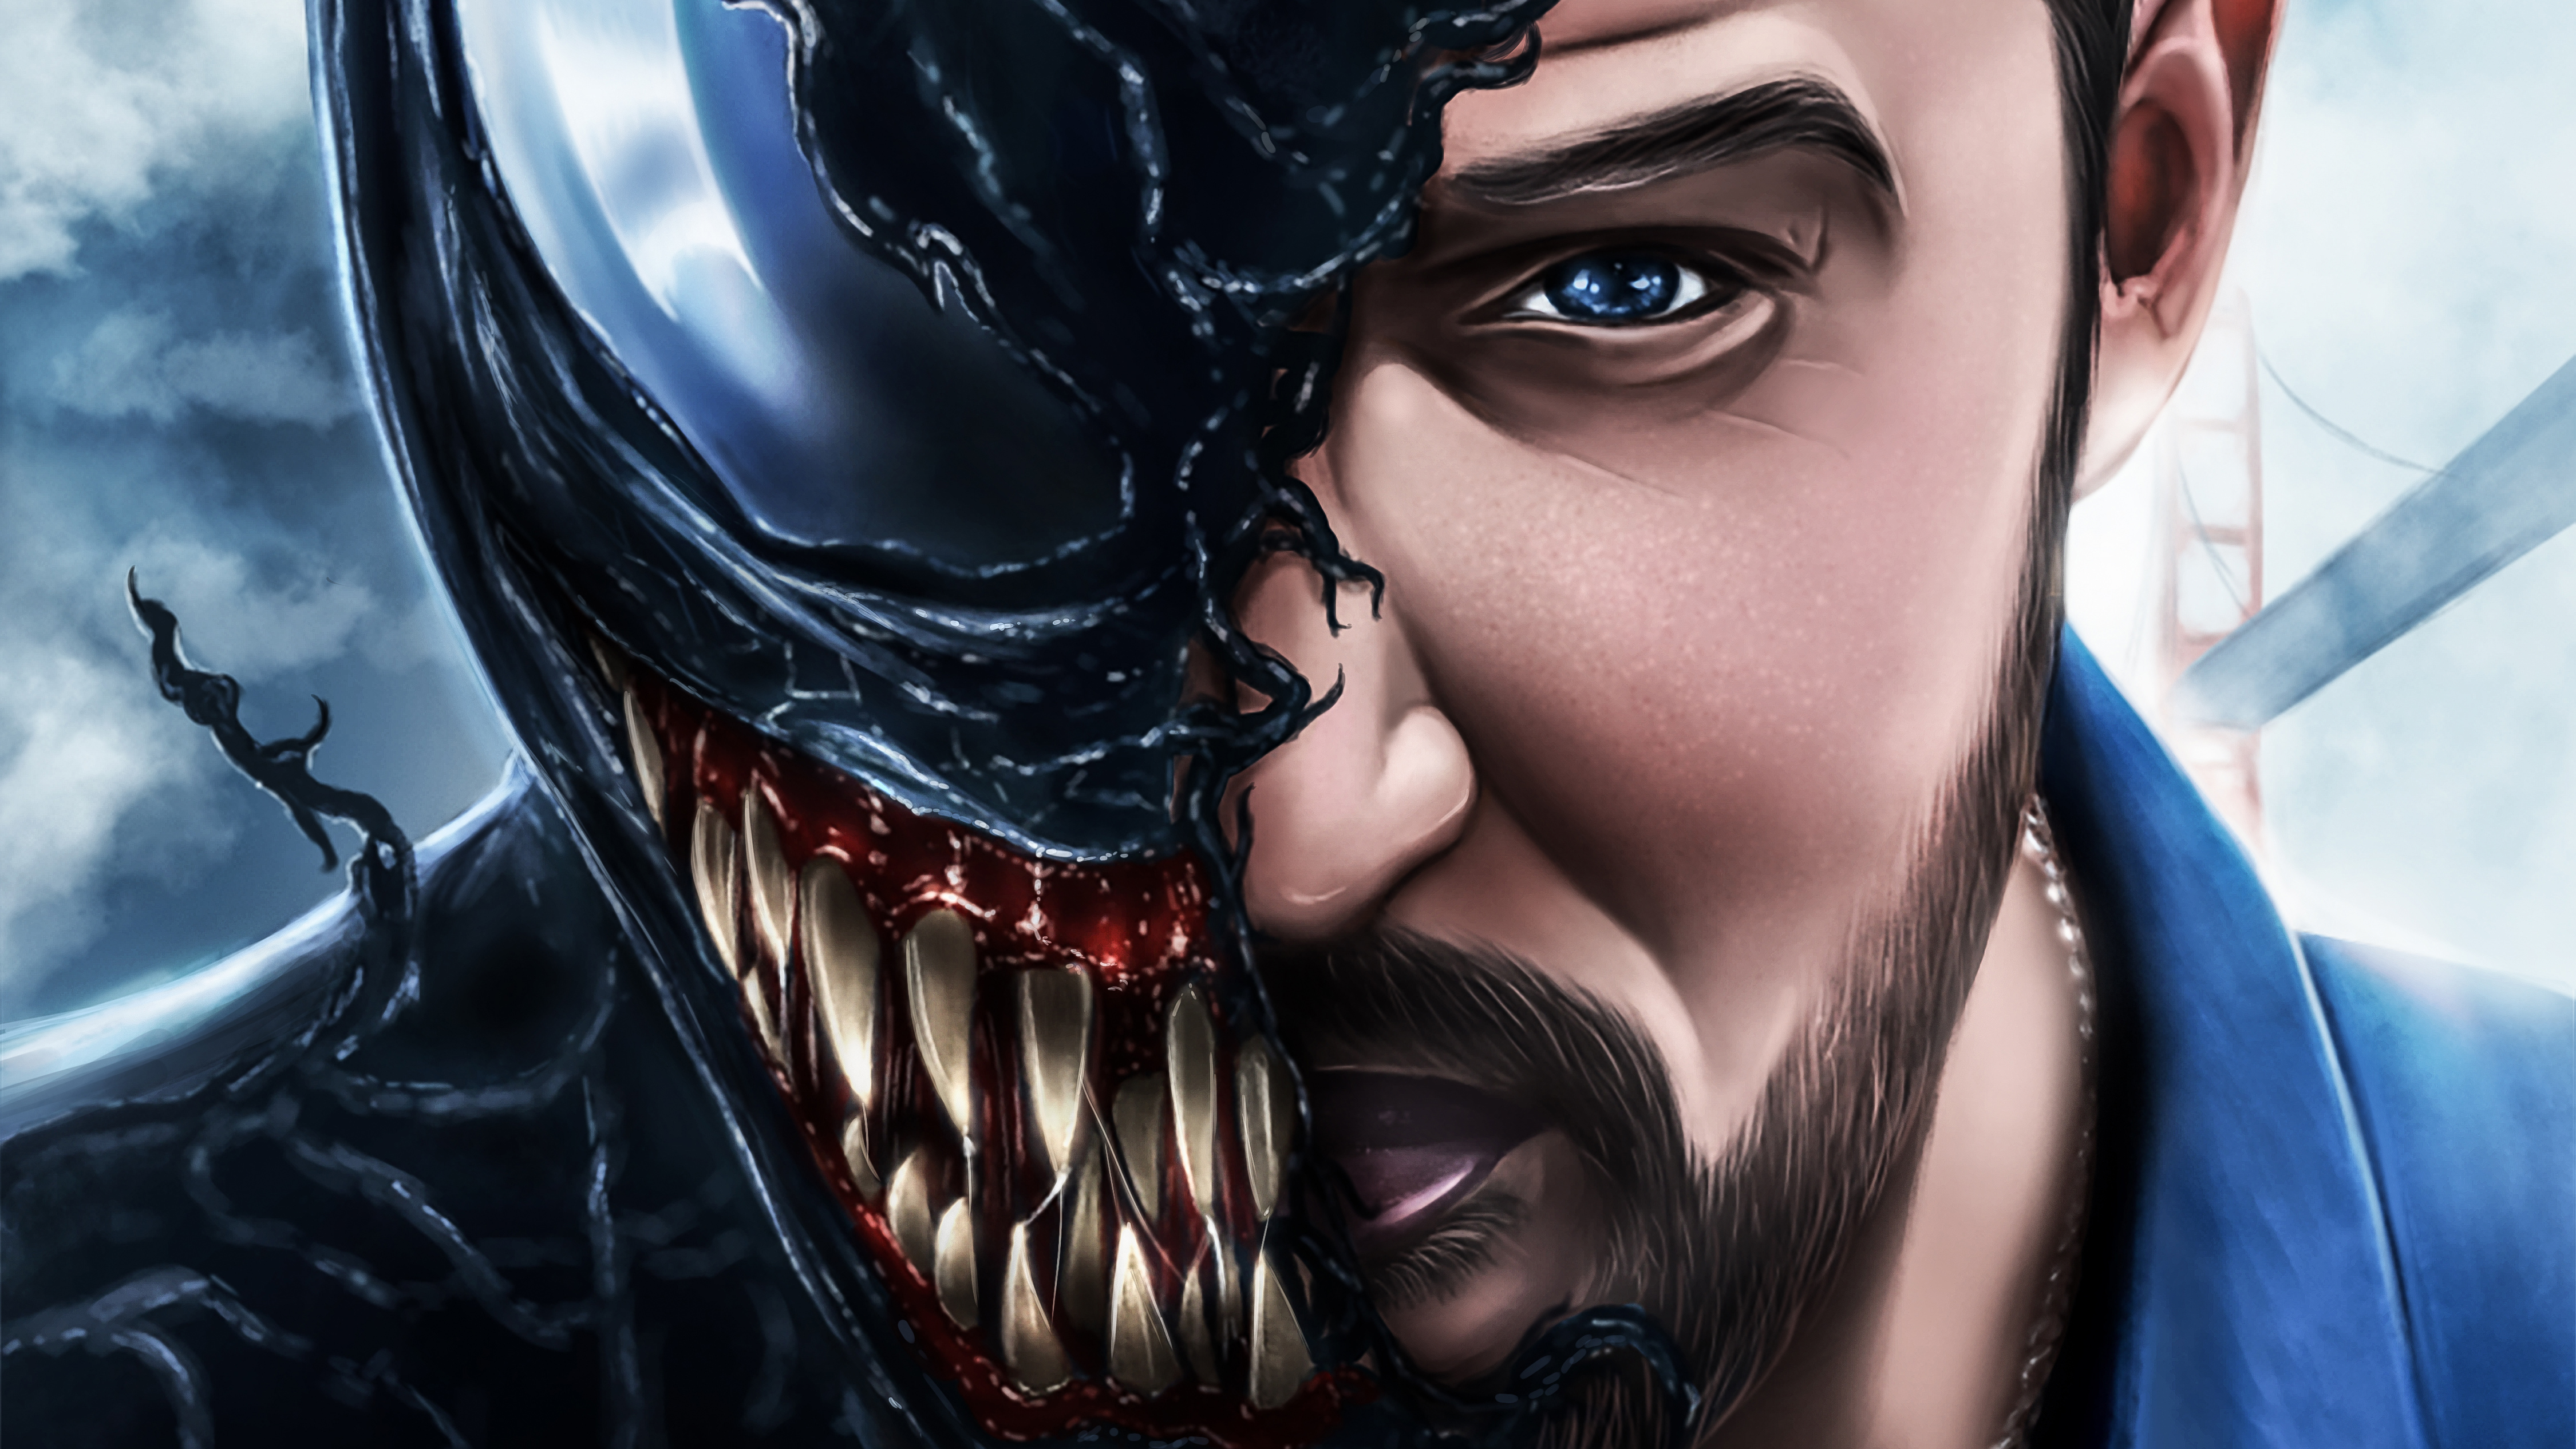 Venom movie artwork 4k 2018 hd superheroes 4k wallpapers - 4k wallpaper venom ...